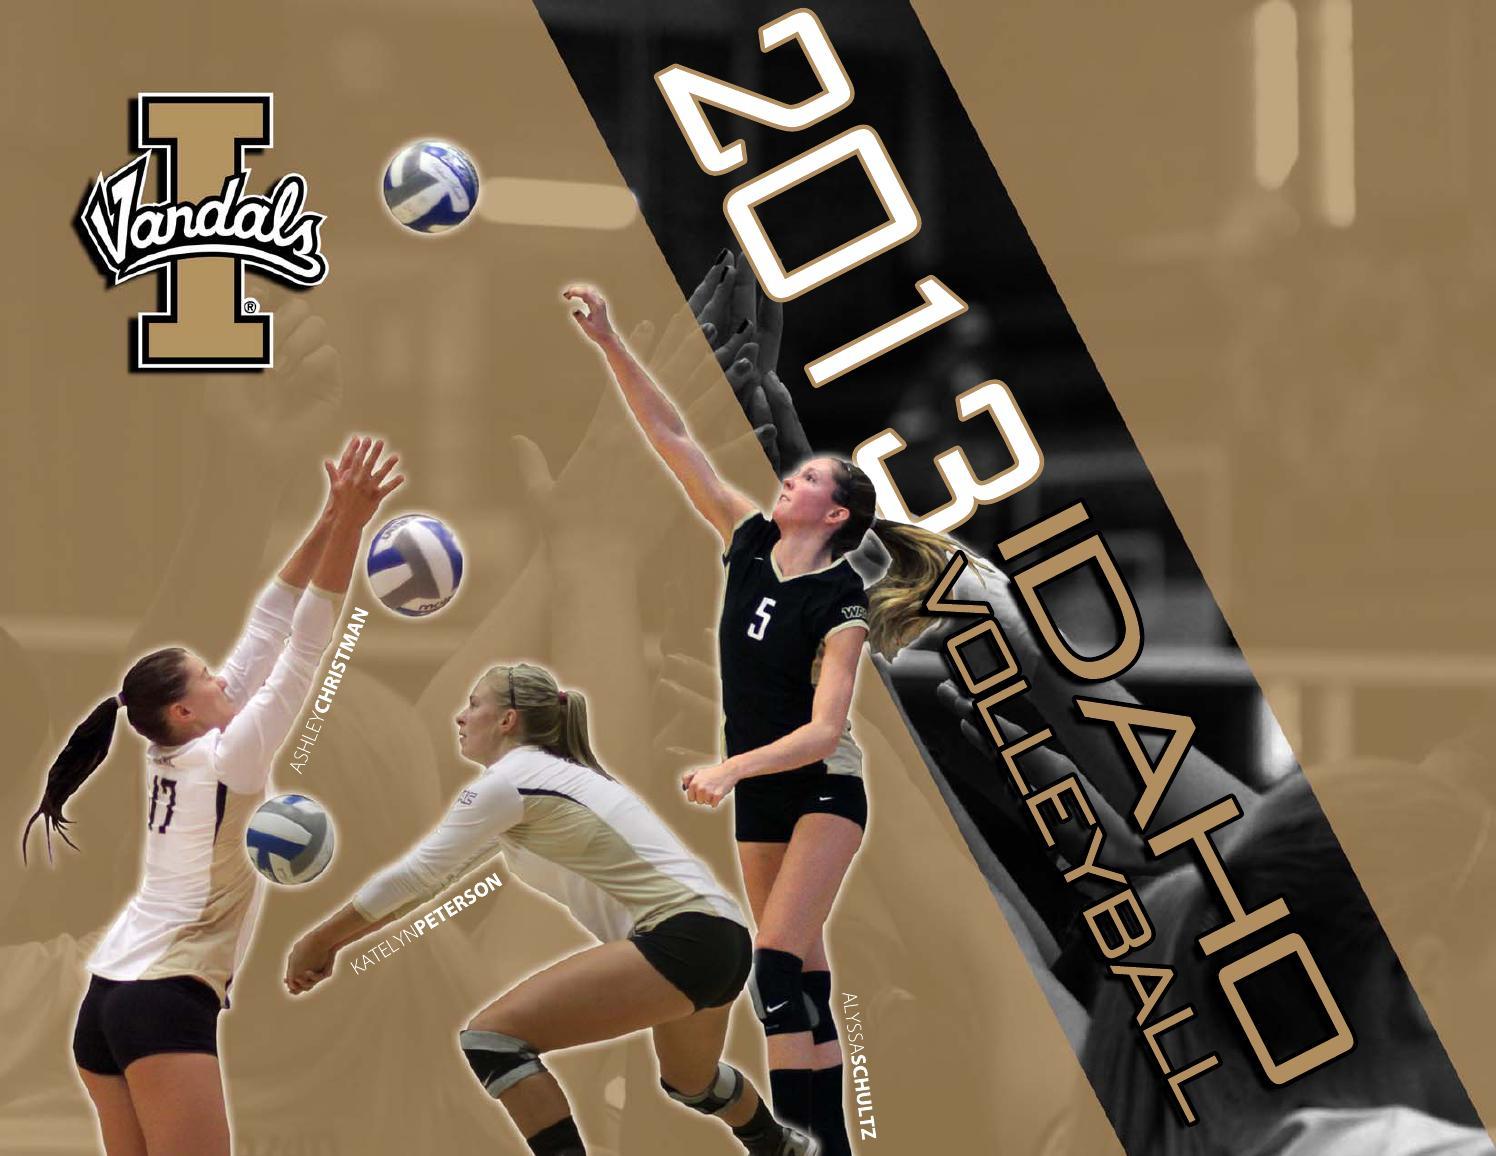 75c5c5ab9f8fc 2013 Idaho Volleyball Media Guide by University of Idaho Athletics - issuu